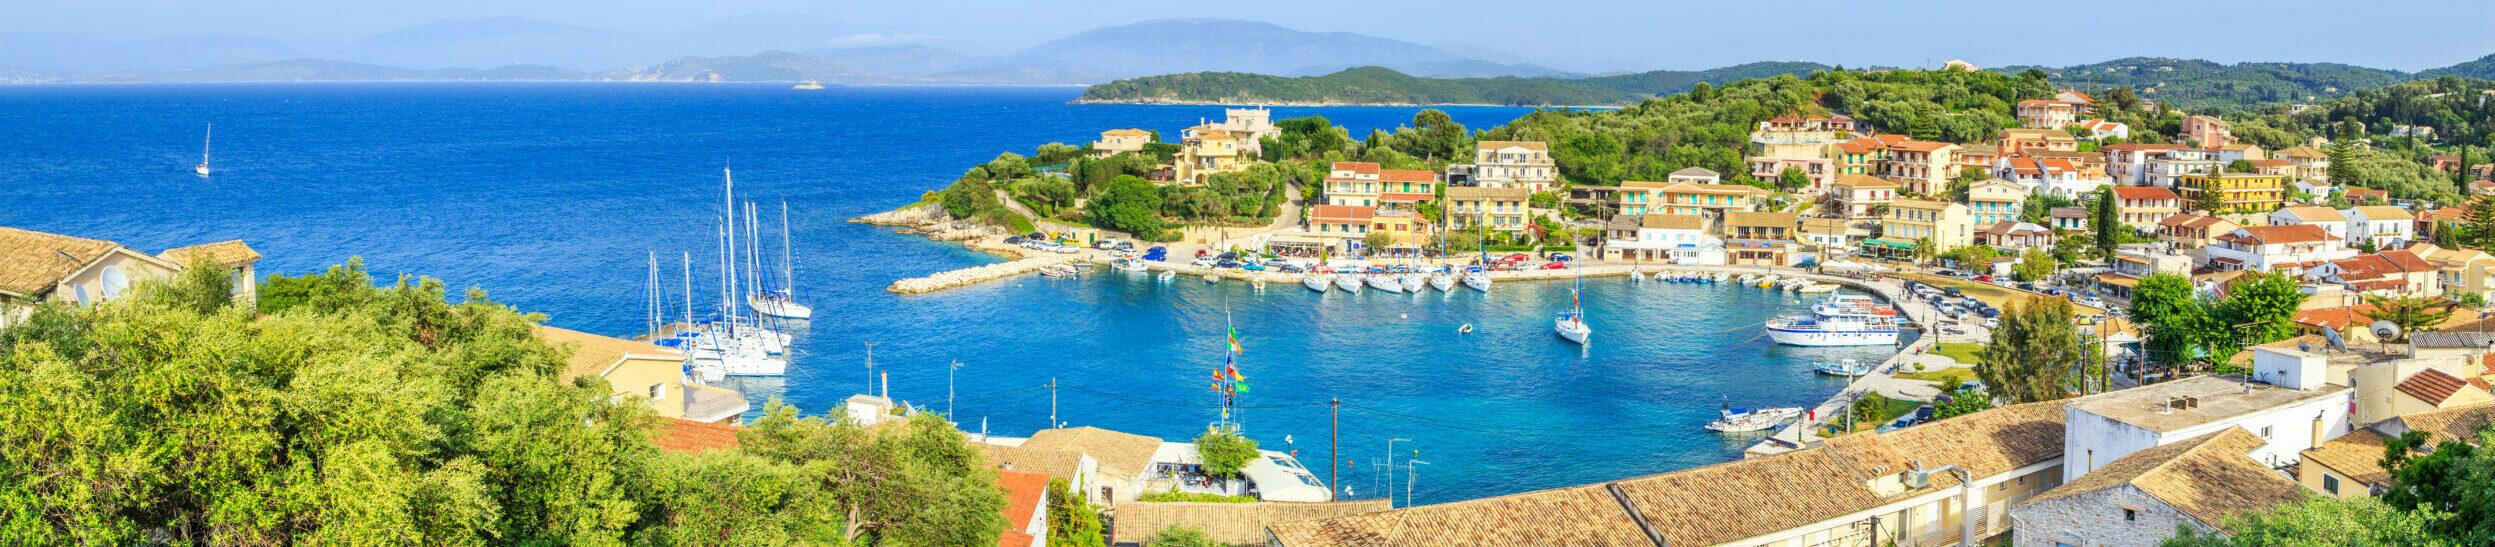 Corfu: Kassiopi – The traditional fishing village in  the island of Pheakes